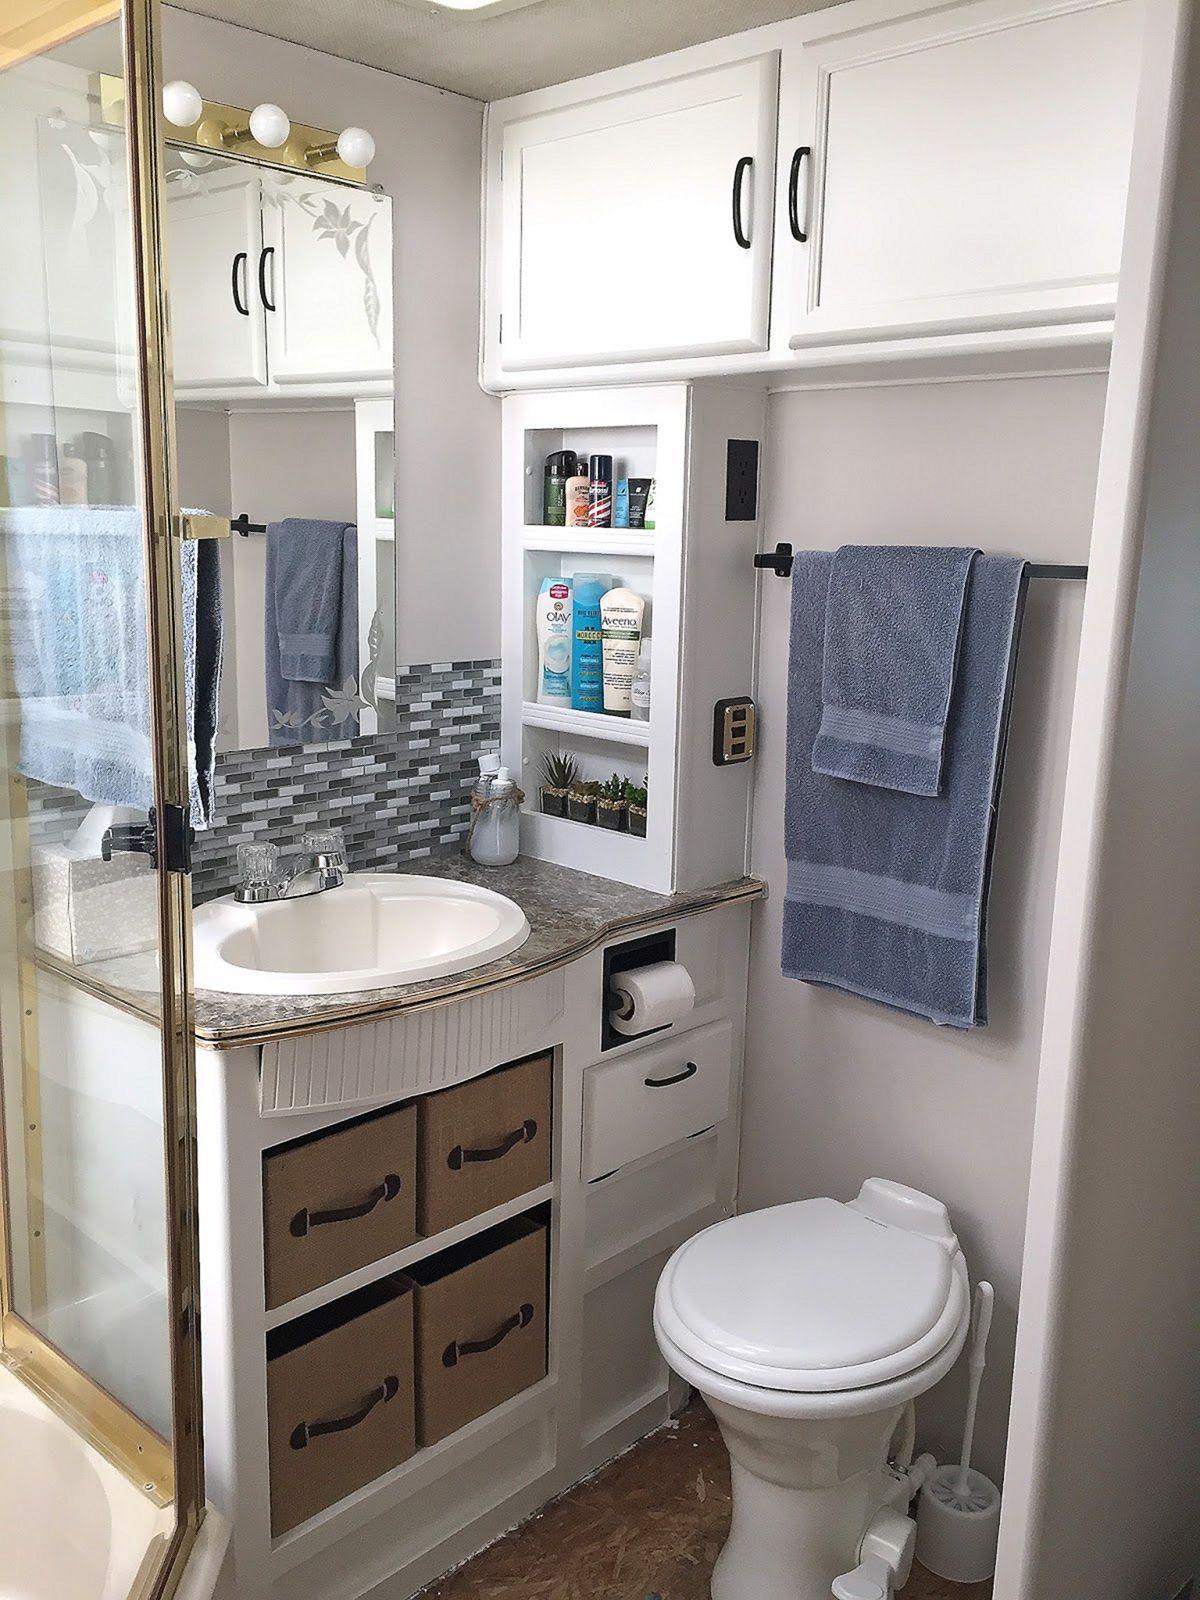 Small Rv Bathroom Decor Its with regard to dimensions 1200 X 1600